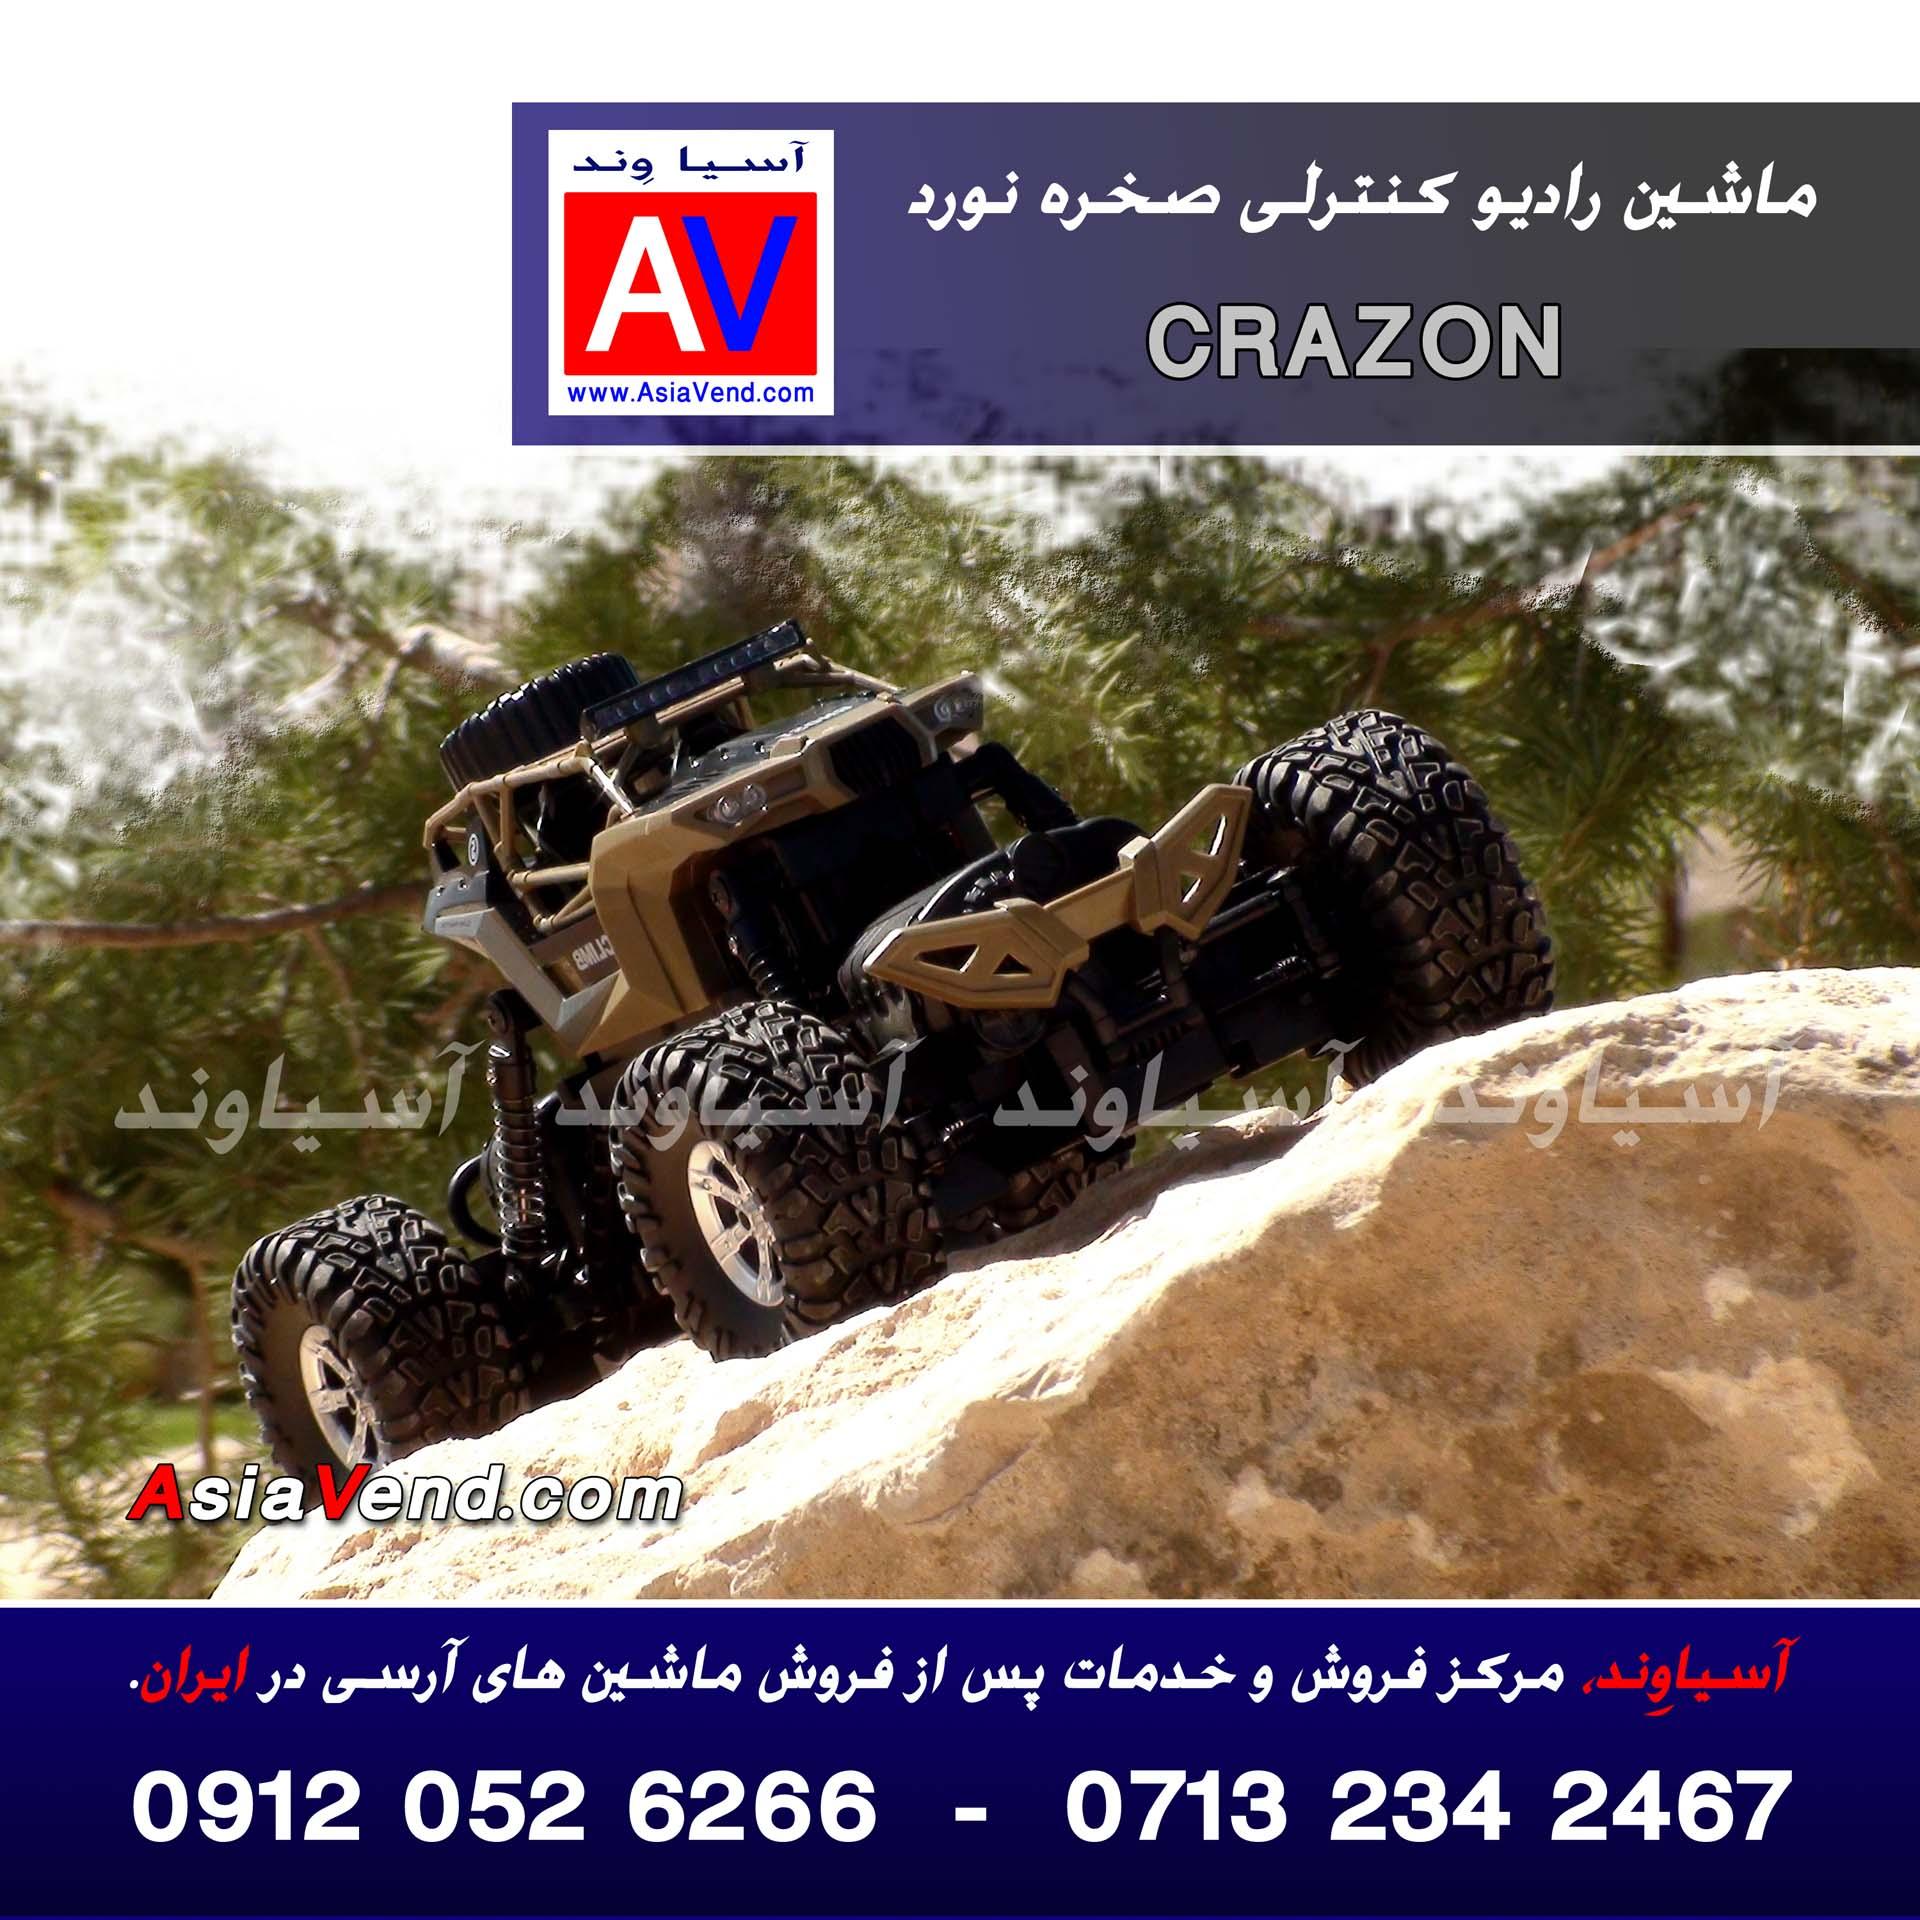 asbabbazi خرید ماشین رادیوکنترلی صخره نورد  Crazon Crawler RC Car Toy